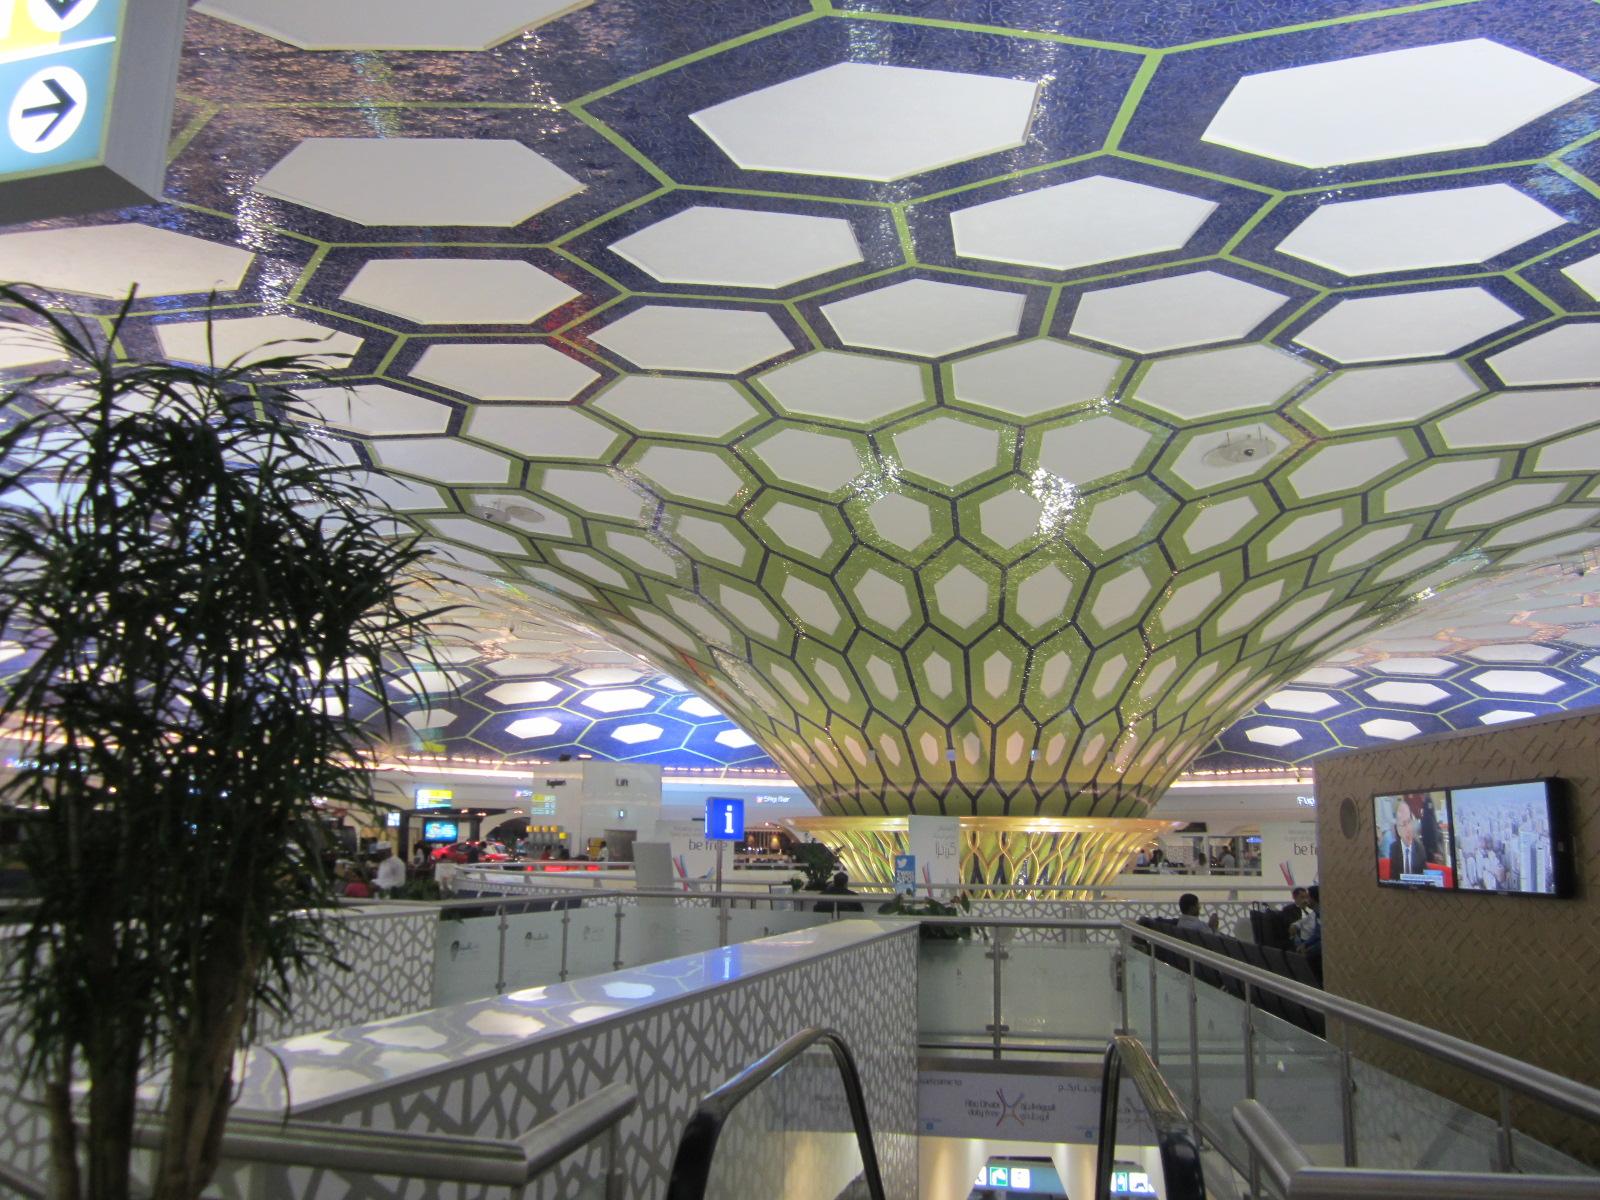 027_Aeroporto Abu Dhabi